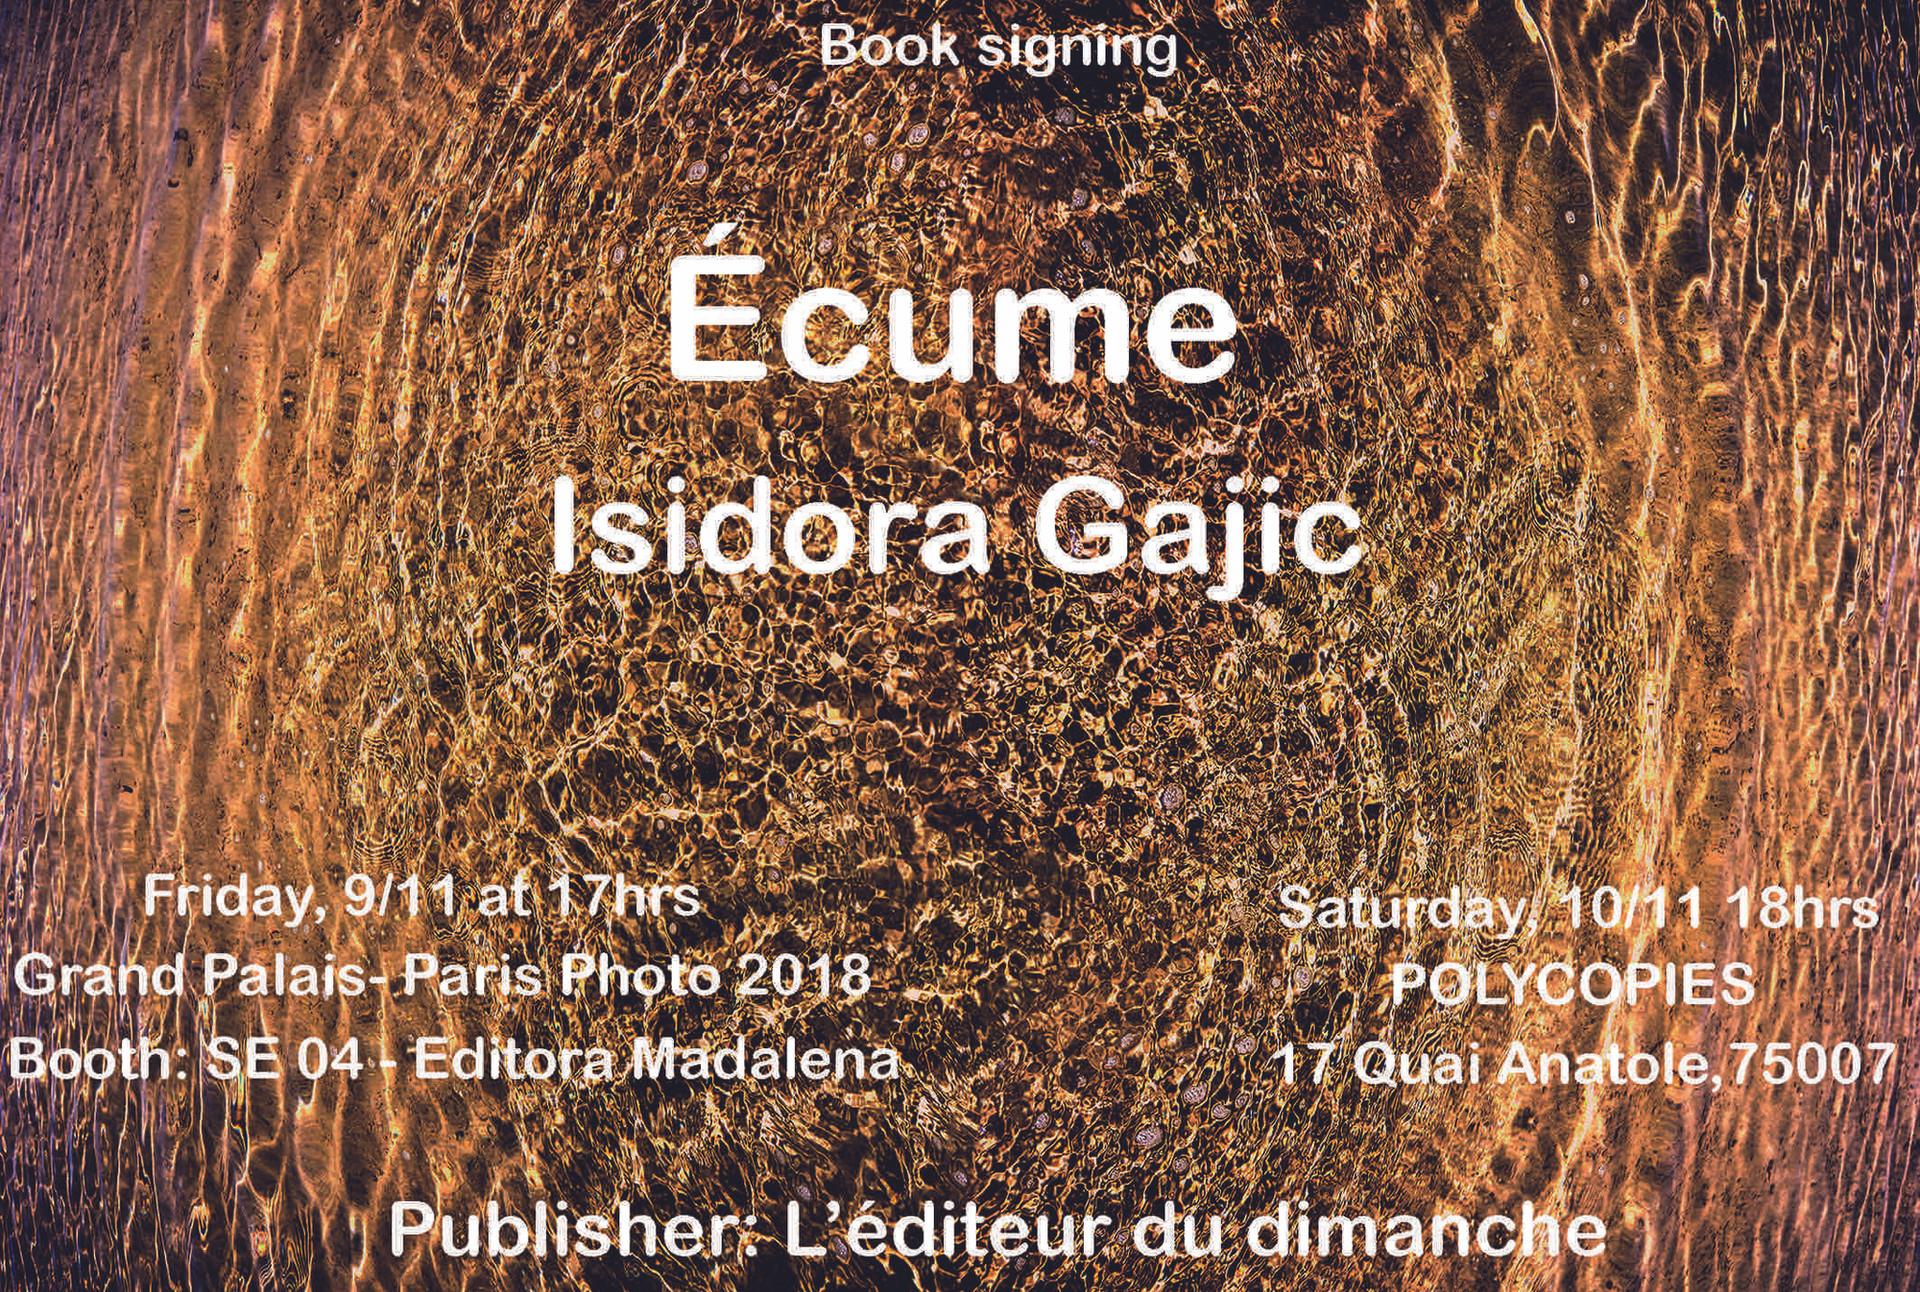 Ecume book signing, Nov. 2018, Grand Palais, Paris Photo, France